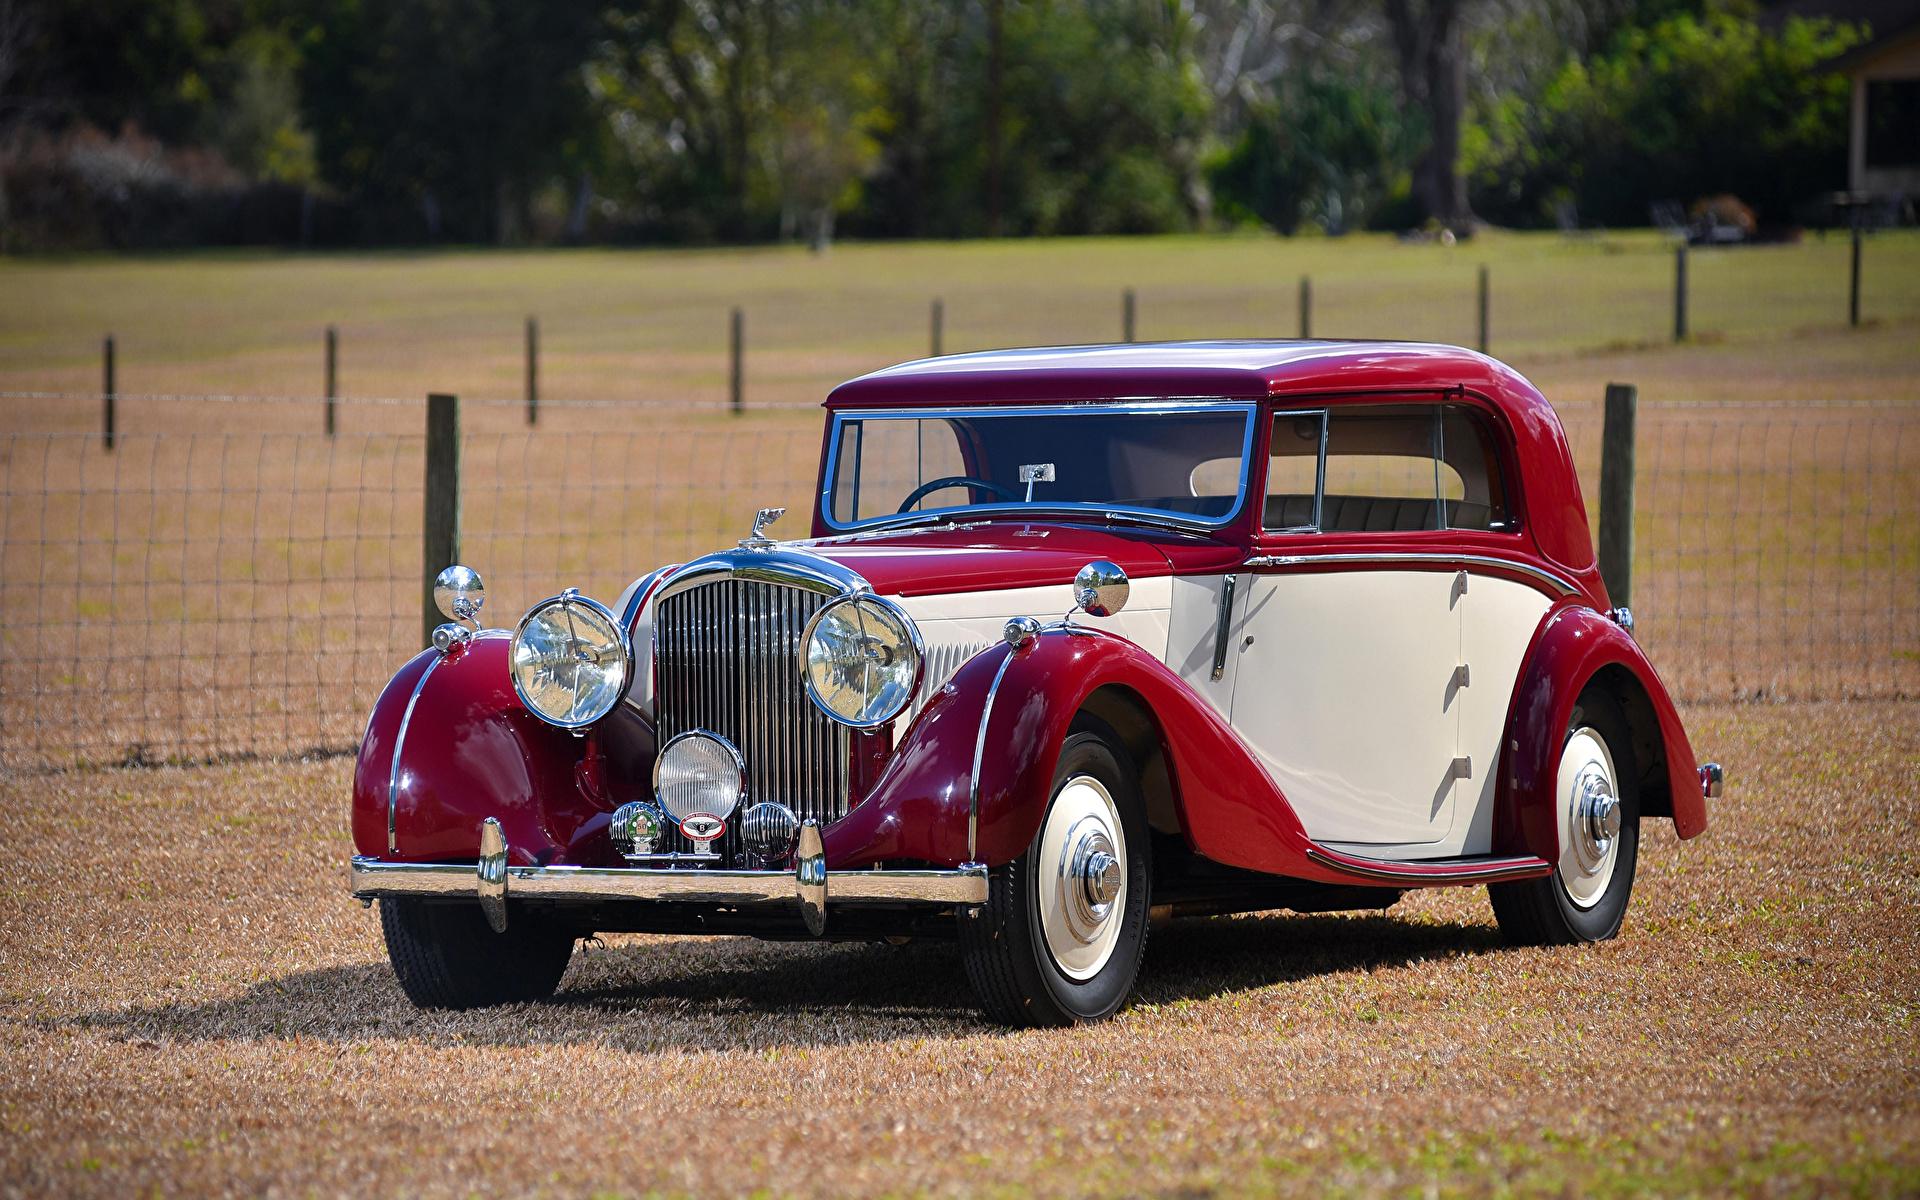 Картинка Бентли 1939 4 ¼ Litre Coupe by Park Ward винтаж Металлик Автомобили 1920x1200 Bentley Ретро старинные авто машины машина автомобиль